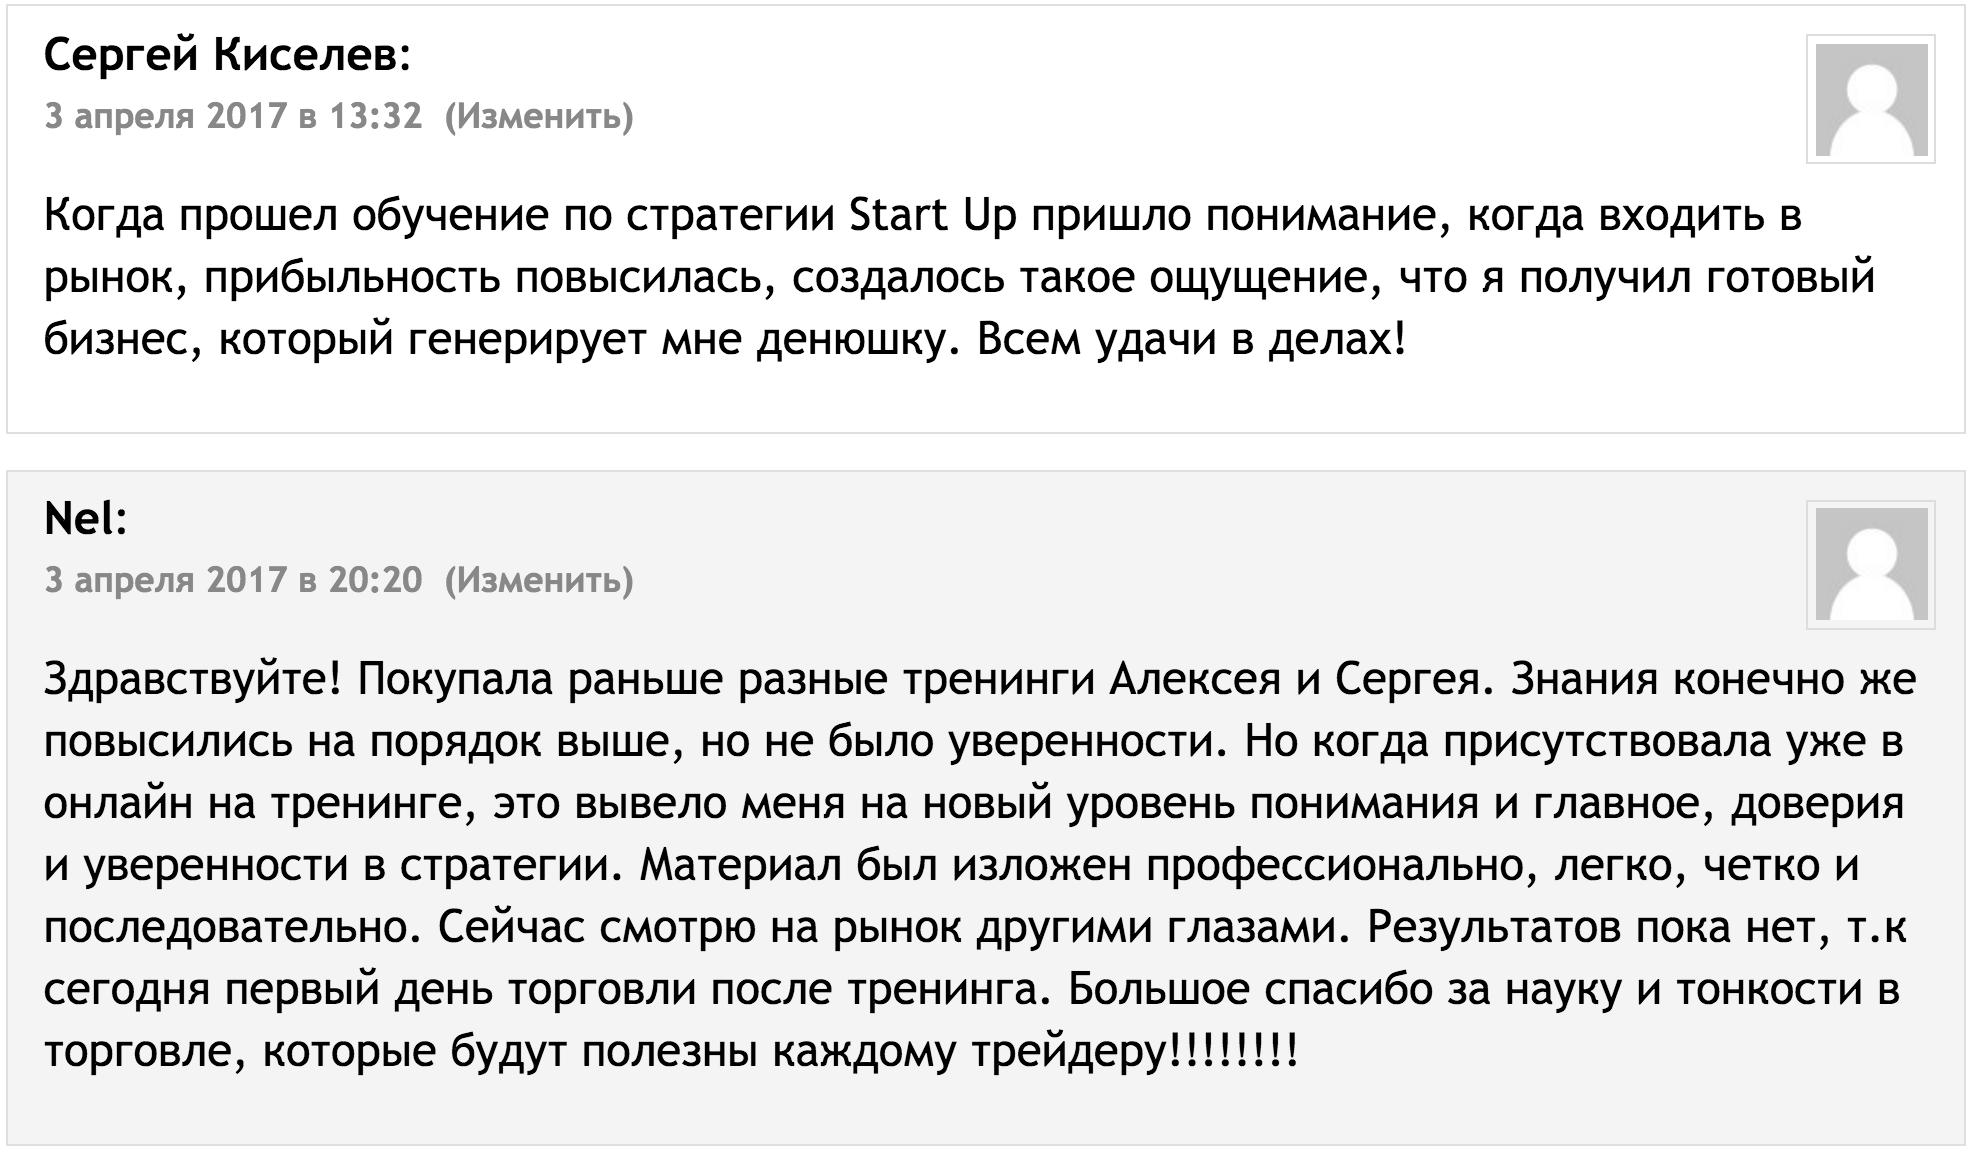 Запись тренинга SF Start Up